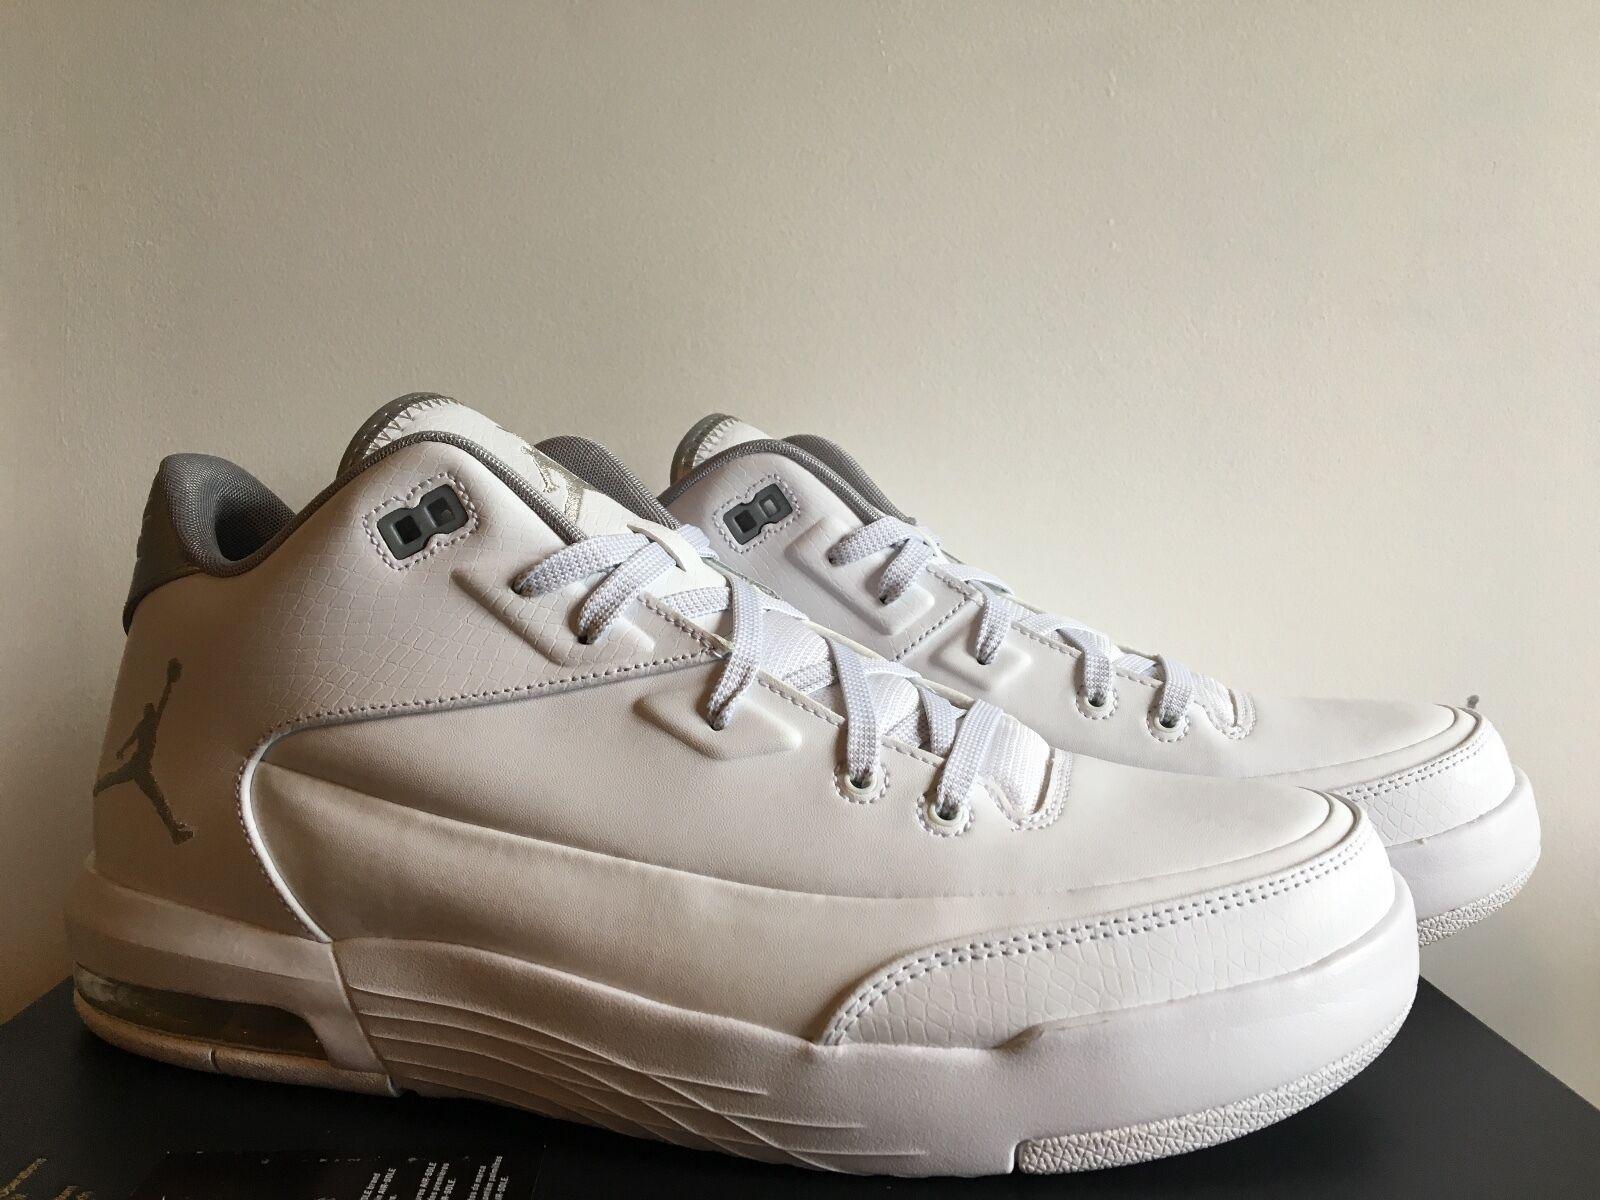 Nike Jordan Flight Origin 3 size 11.5 white training running shoes 820245 100 Special limited time